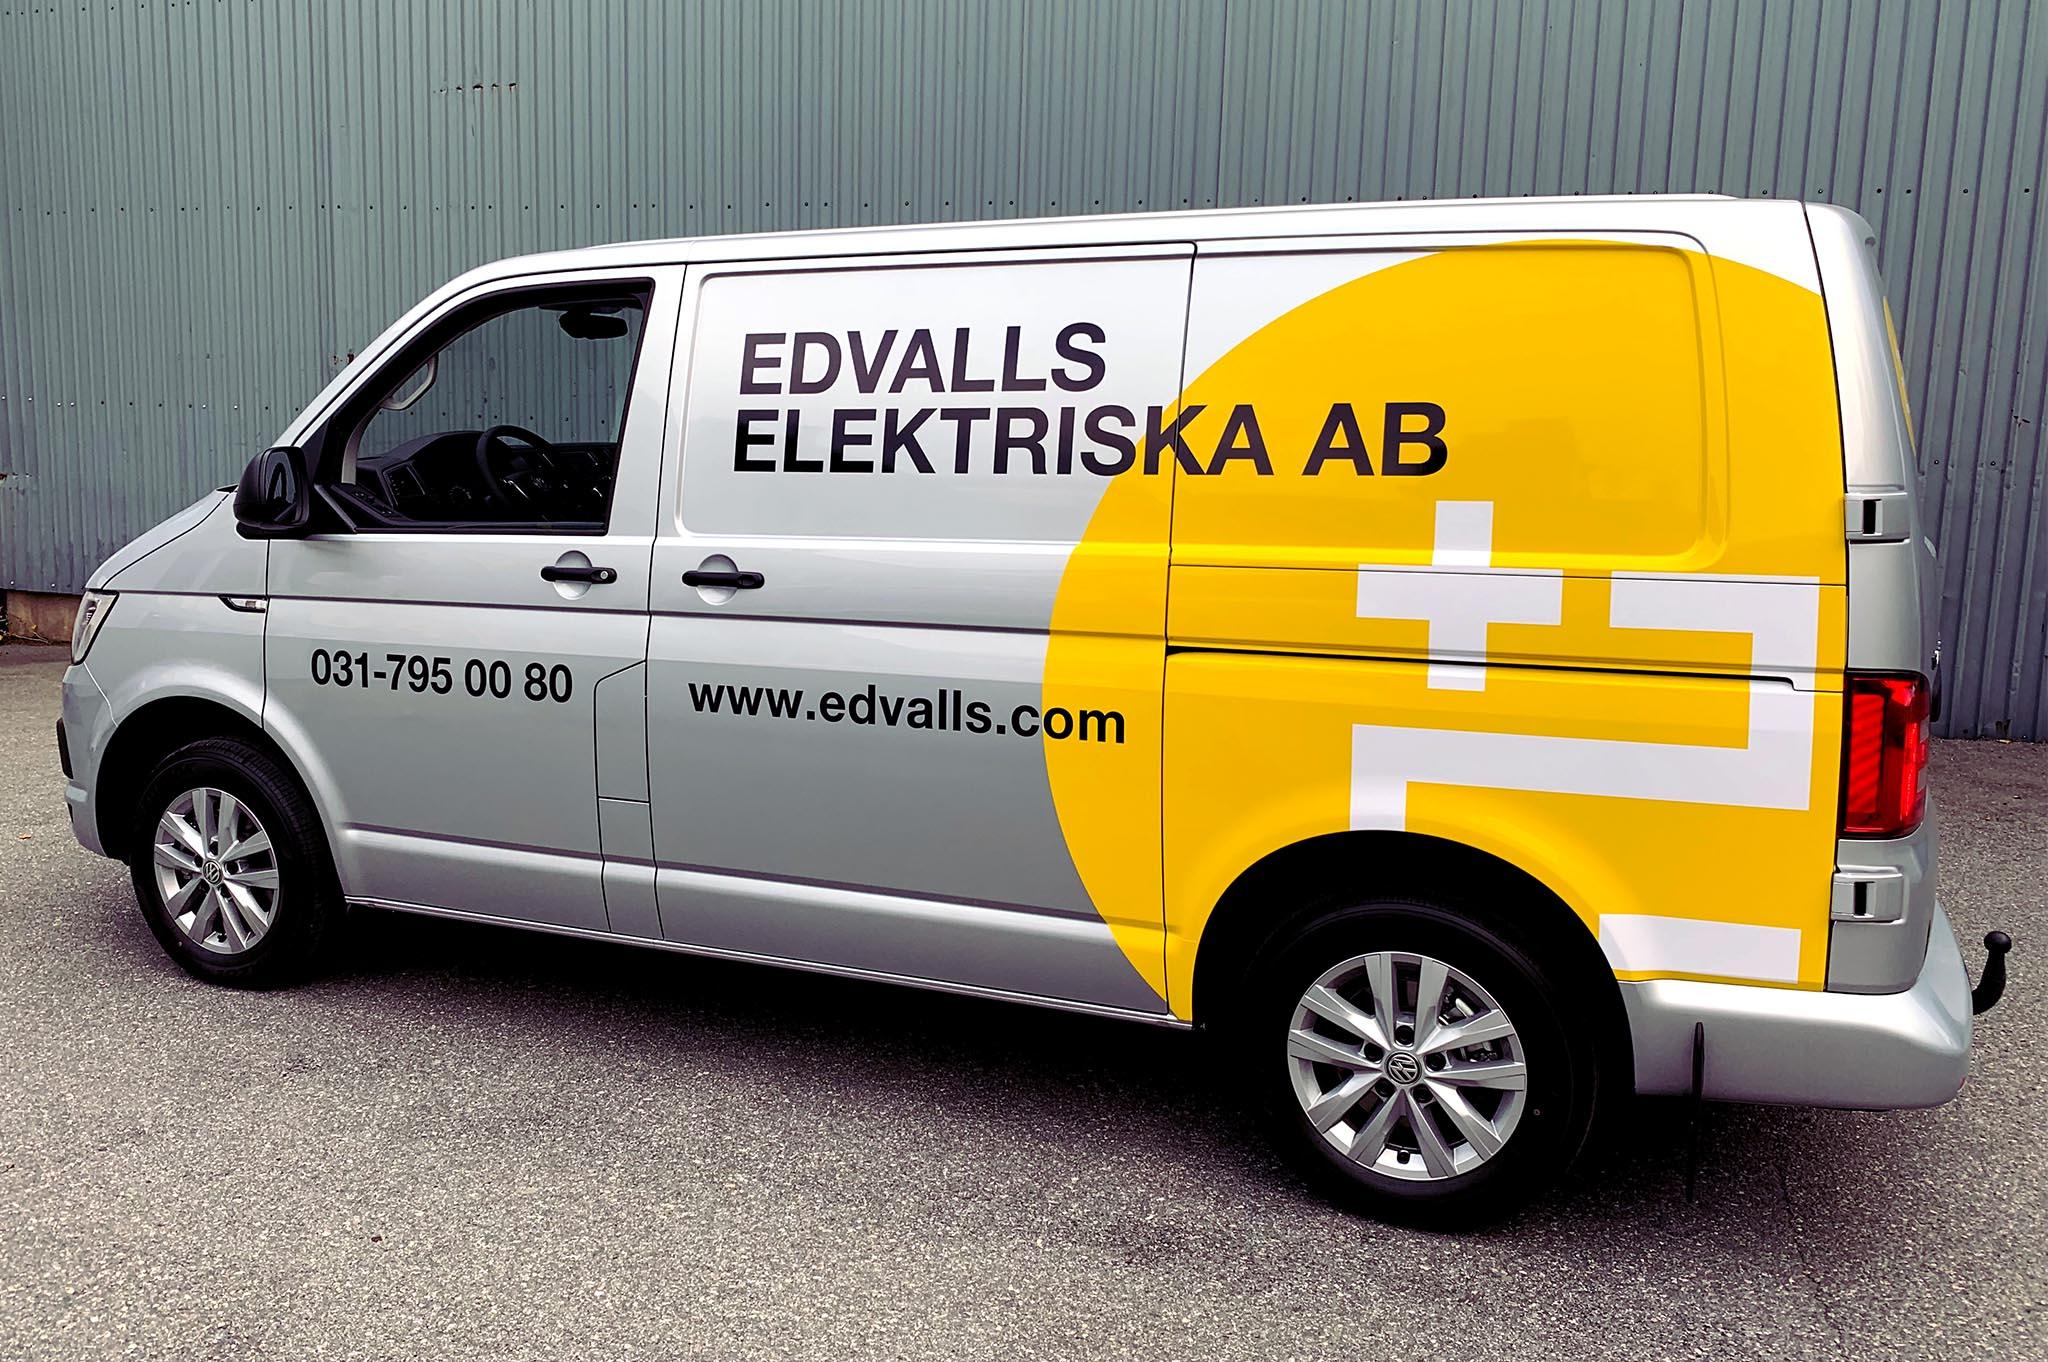 bil dekor bildekor dekaler edvalls elektriska volkswagen wrapping